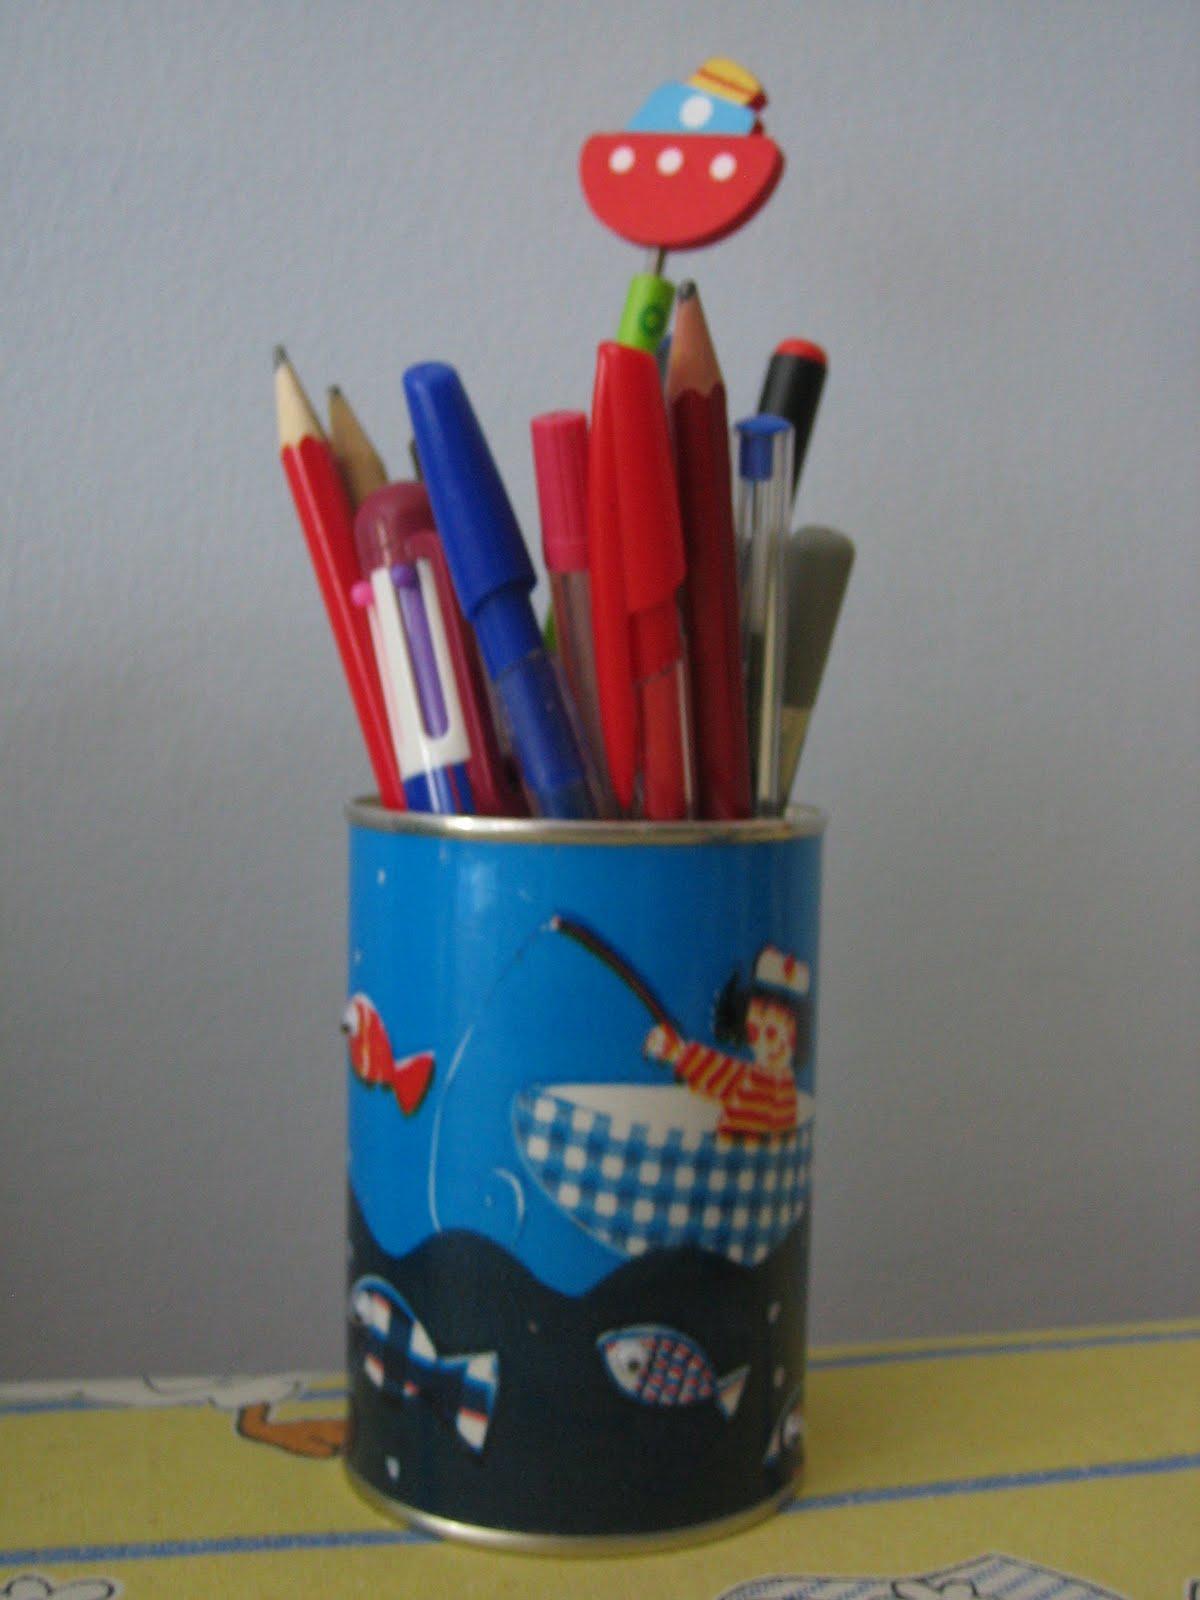 http://2.bp.blogspot.com/_x9KSp9hVJb8/S8nHs4NbpTI/AAAAAAAAAK4/clr5aYXMu4I/s1600/Pots+mariners+(3).jpg